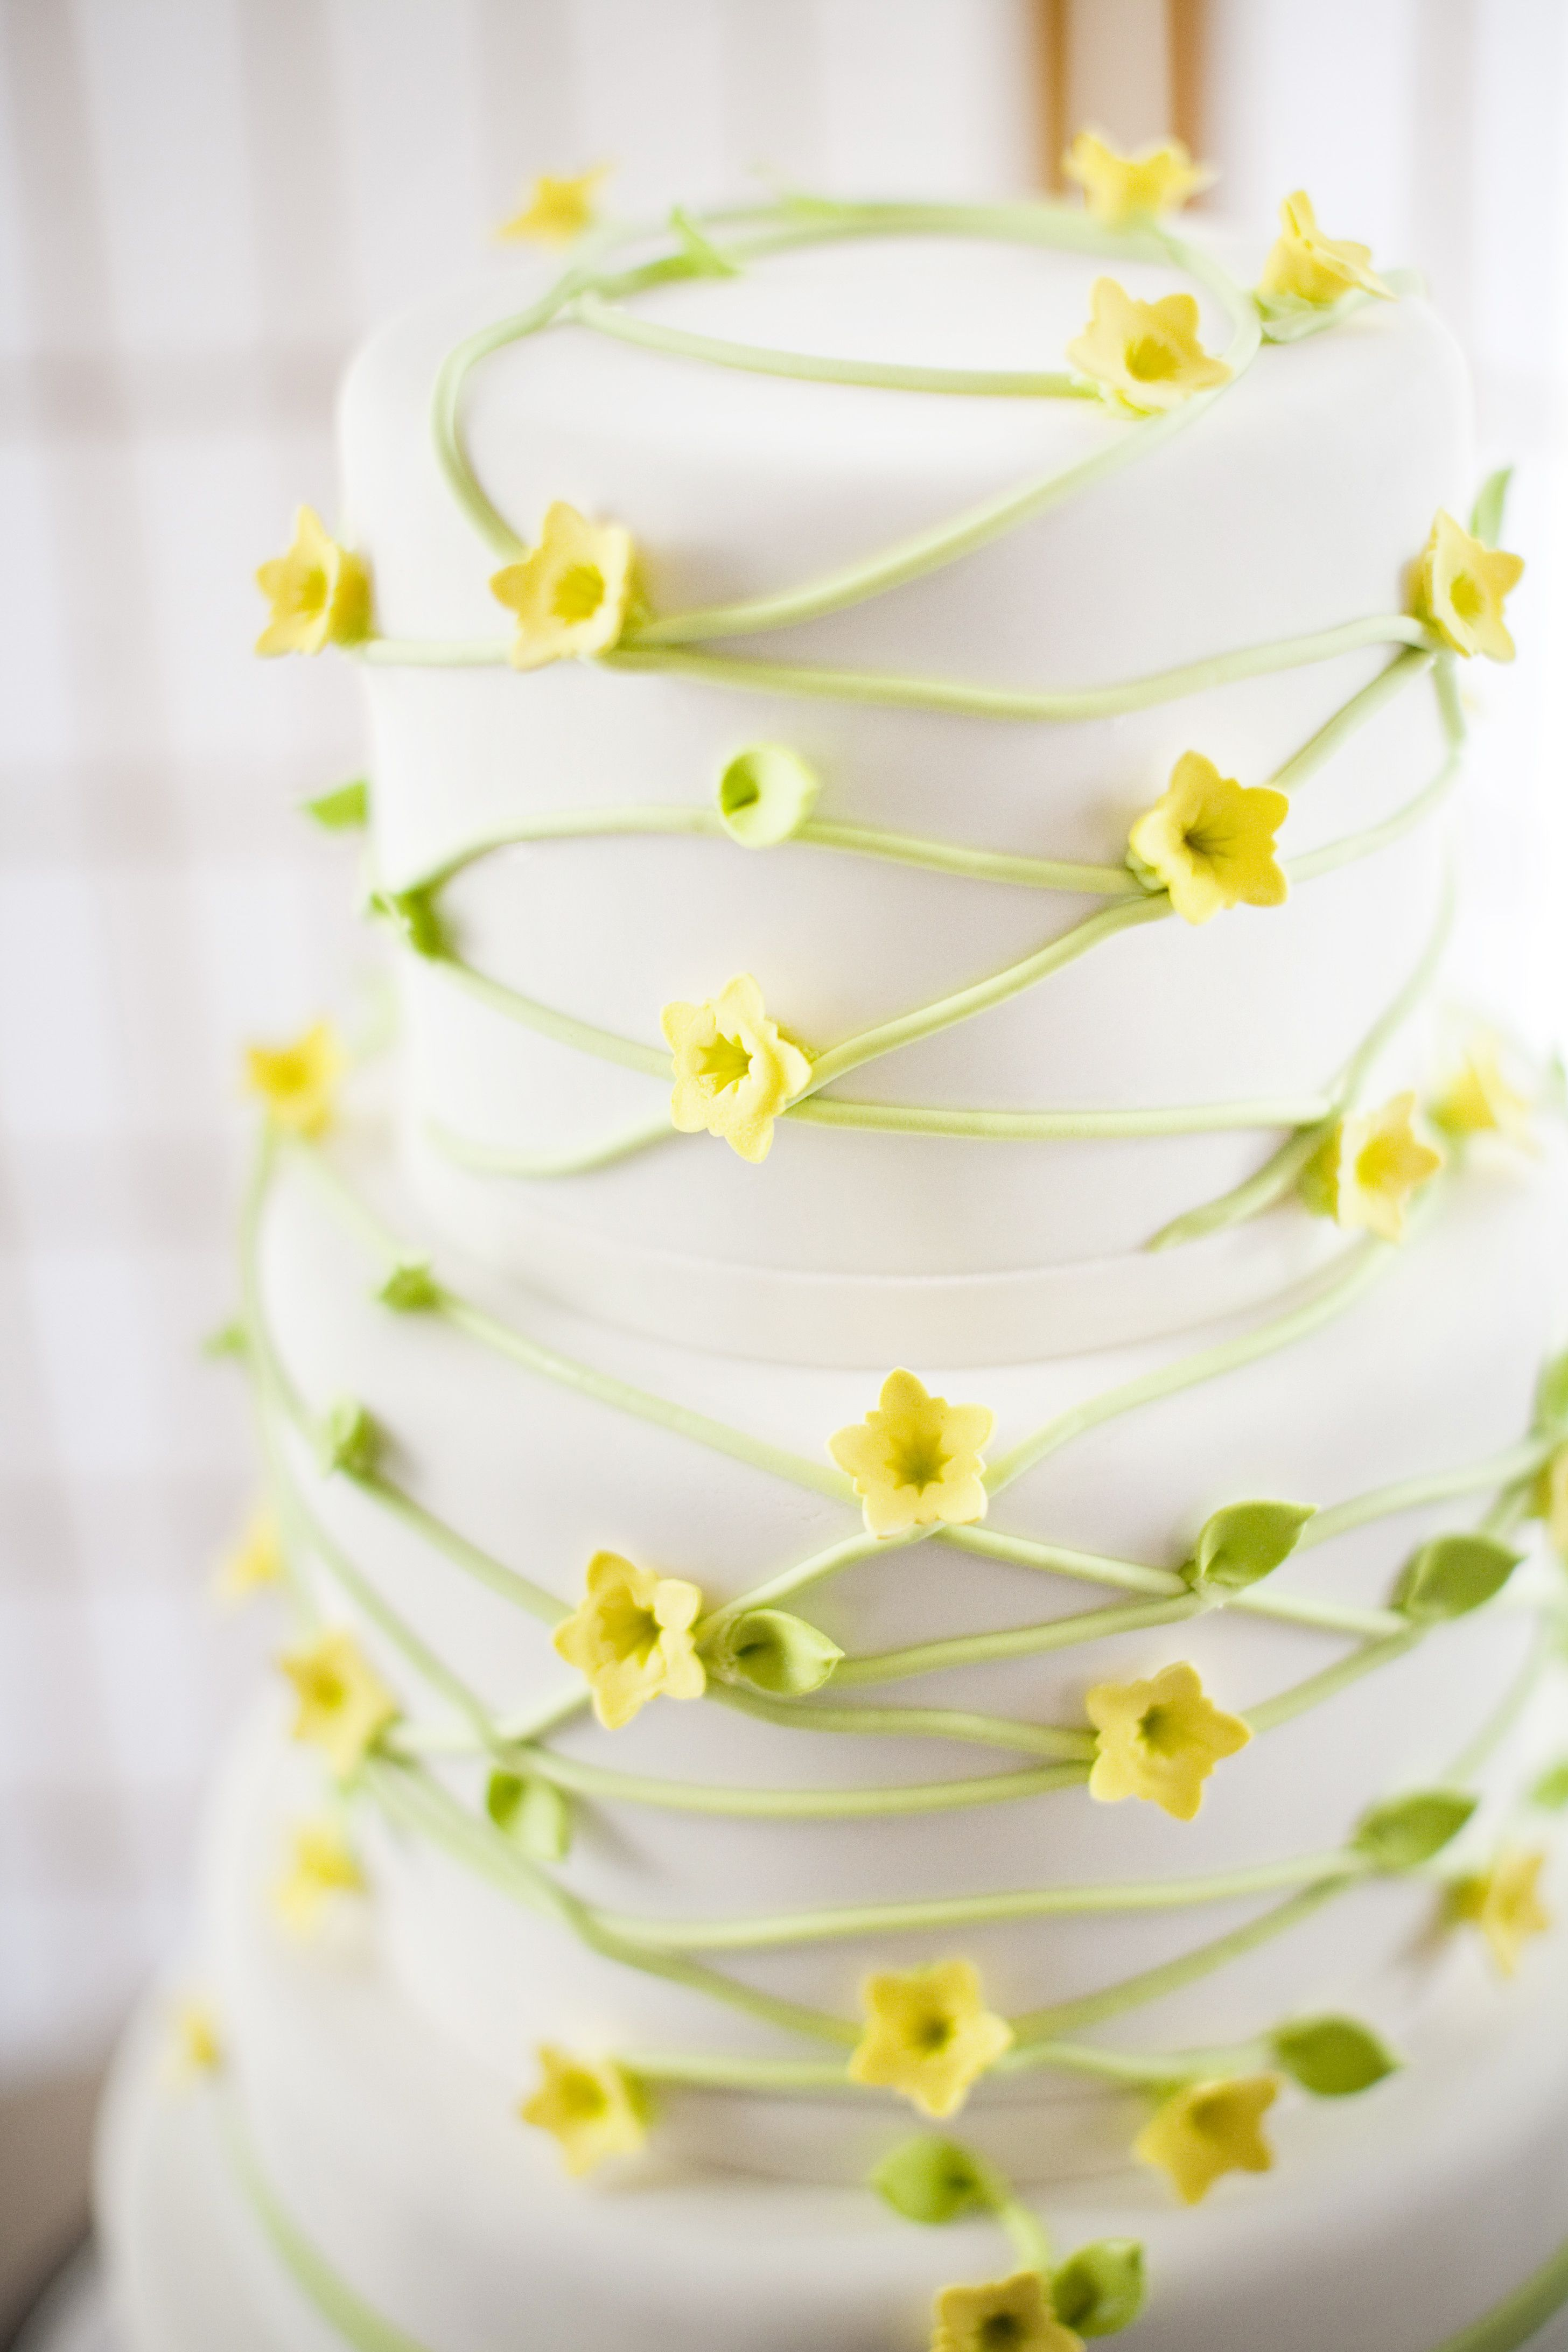 A Modern Interpretation of Yellow Jasmine & Spring Green Vines ...